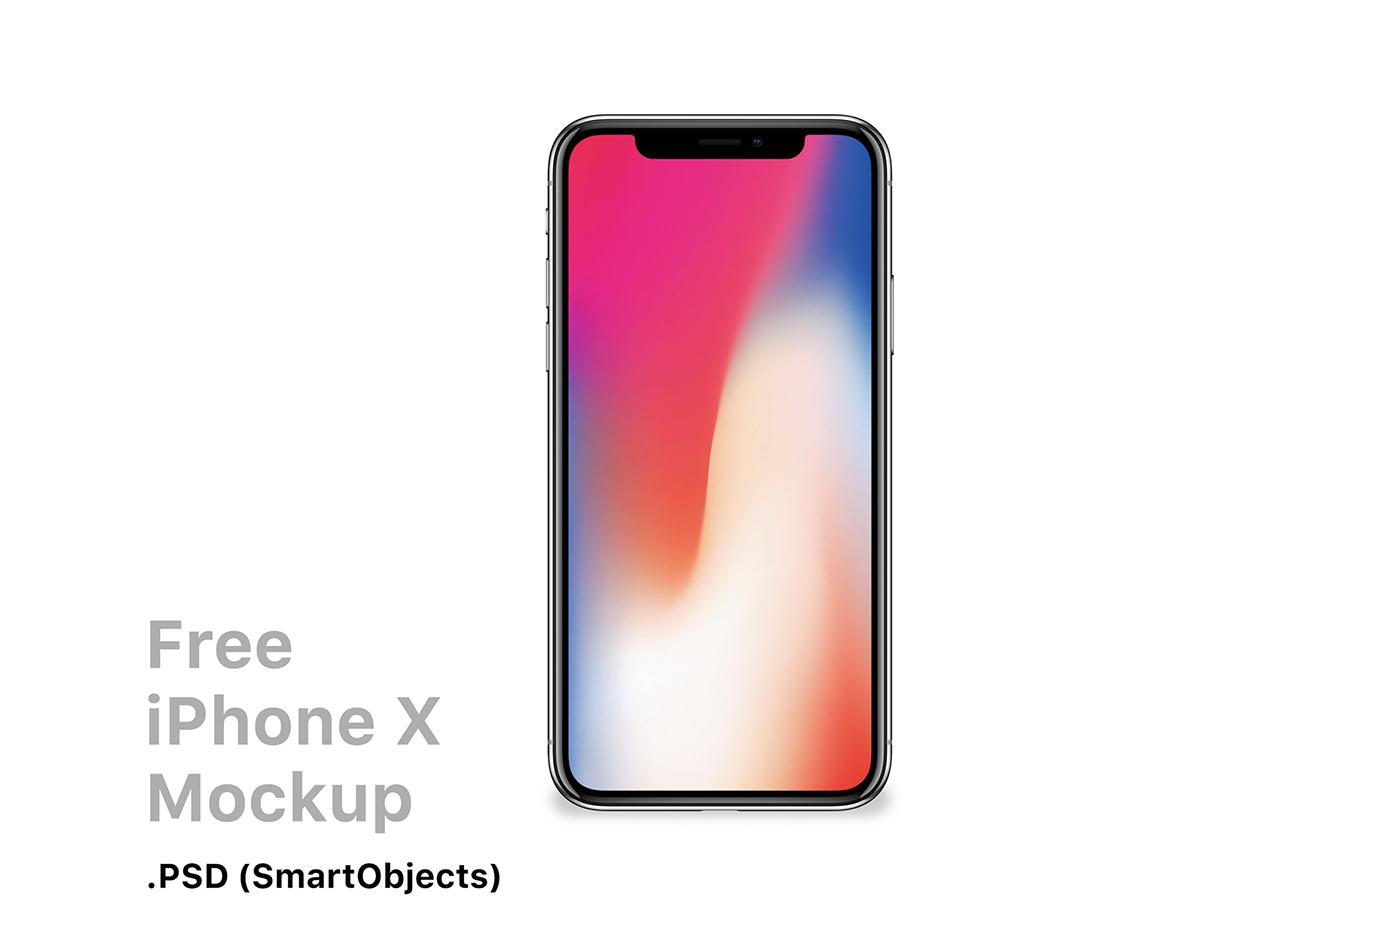 freebie mockups apple iphone8 Mockup iphone iphonex free